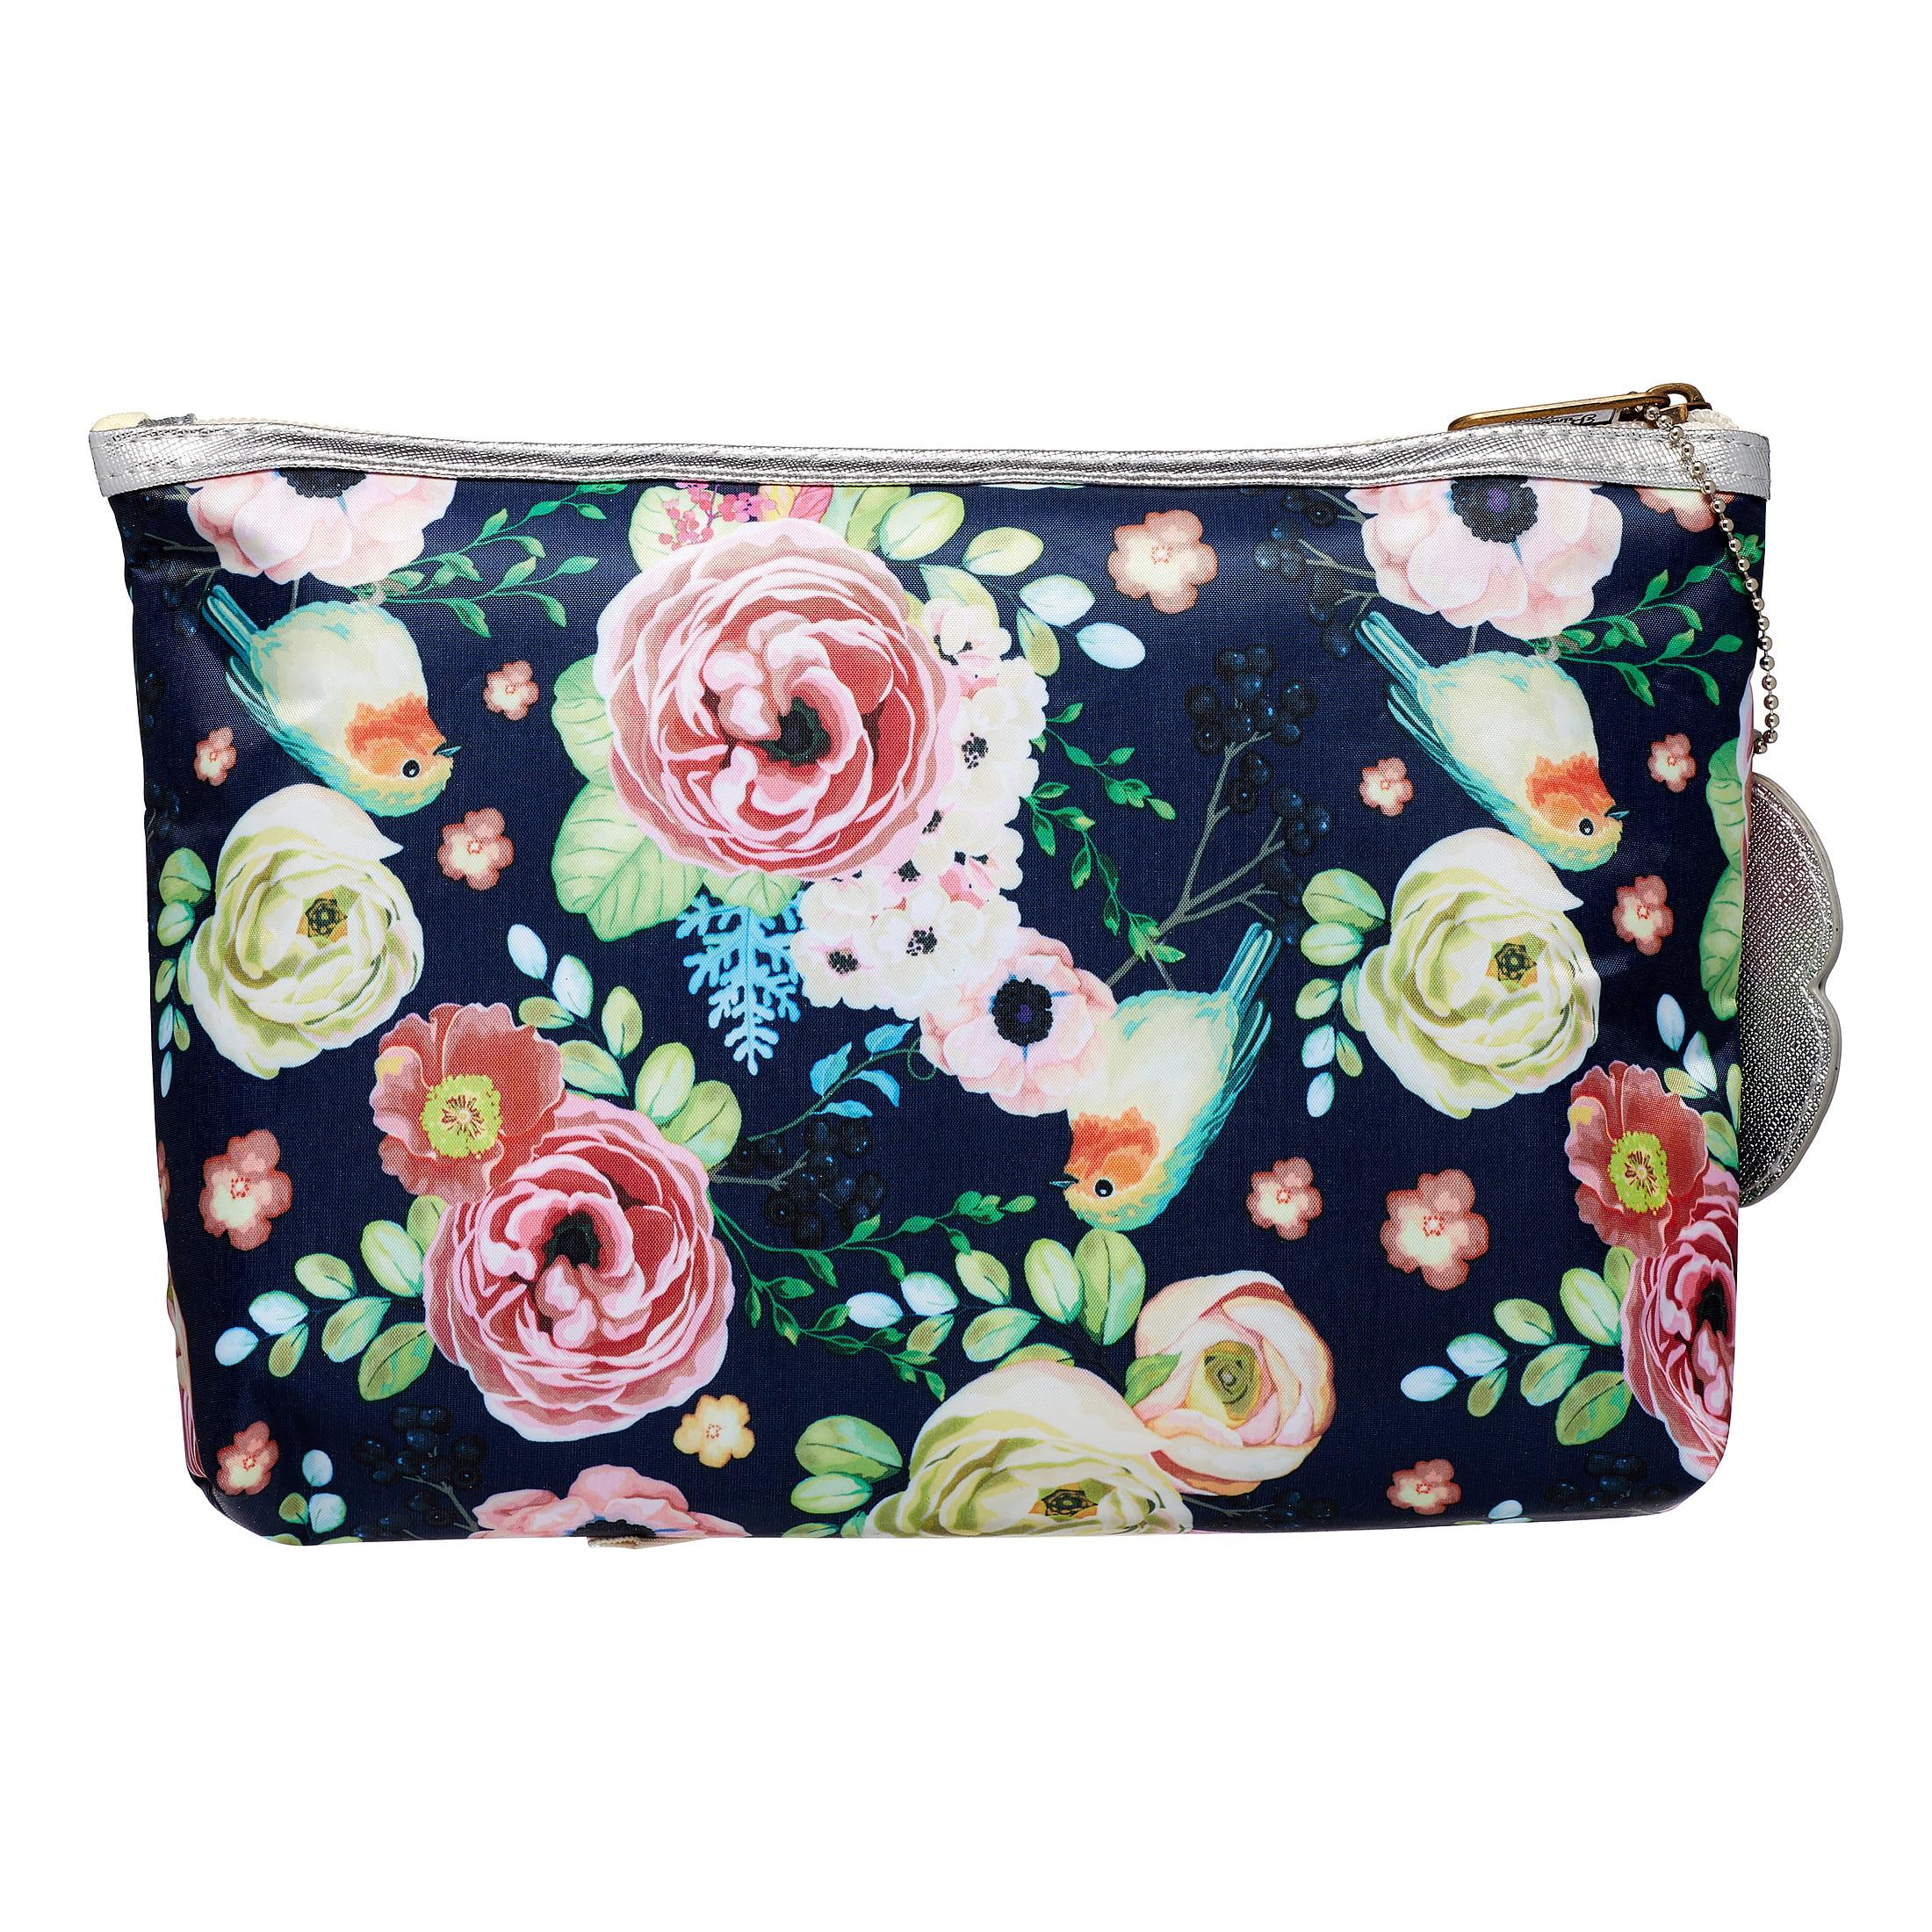 b43c543a37cb Primrose Hill Makeup Bag 2-piece Clutch Set Rose Floral ($15 Value ...